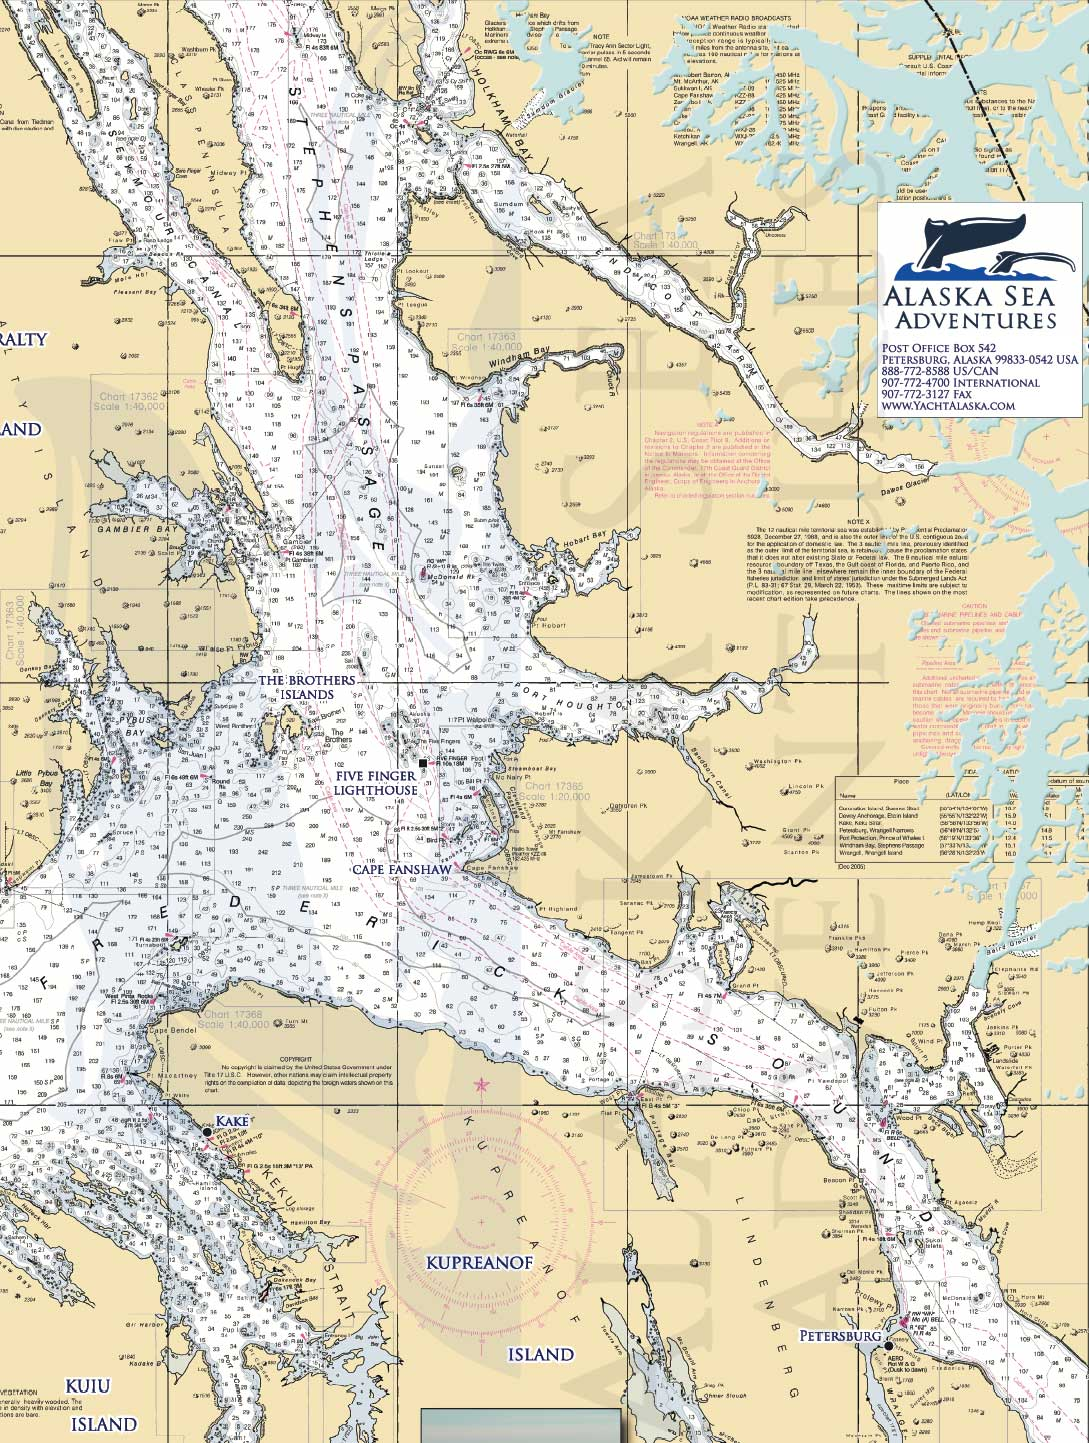 Alaska Sea Adventures SE Alaska Maps Alaska Sea Adventures